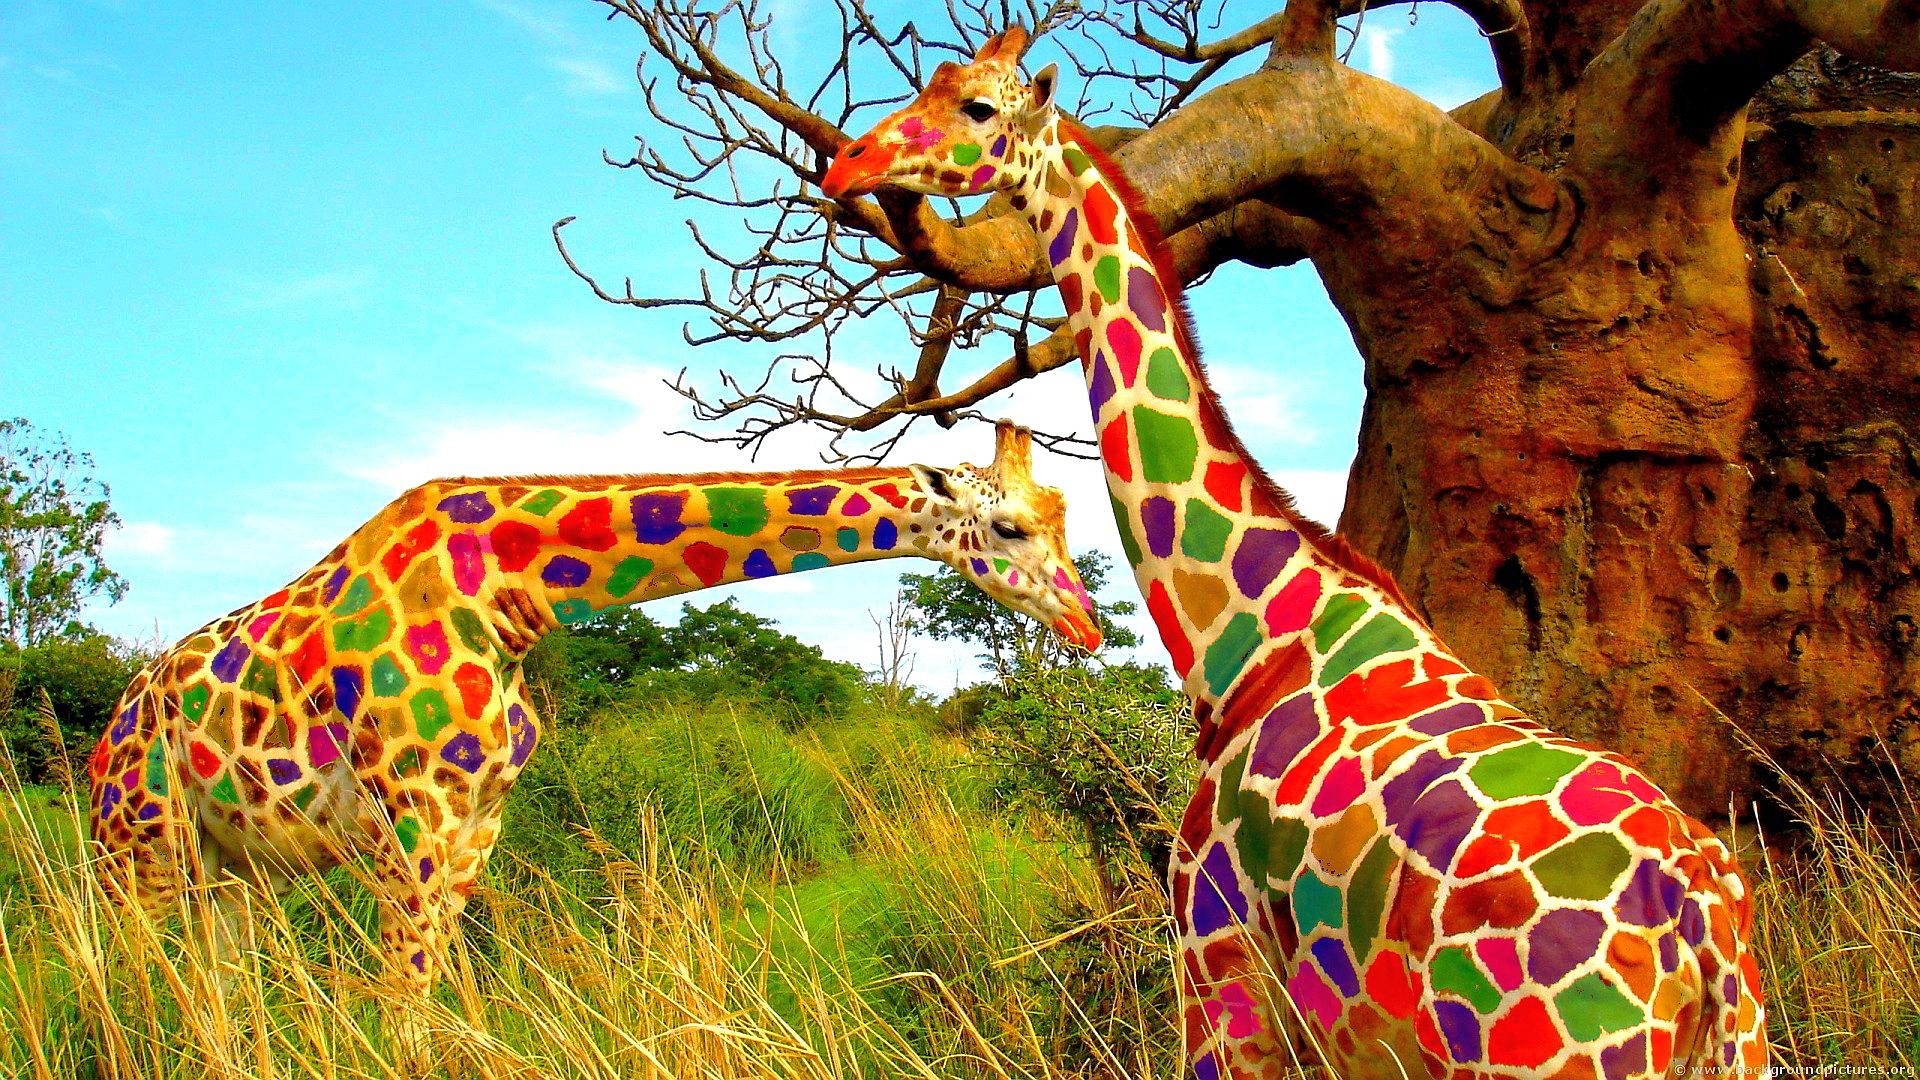 Colorful giraffes art